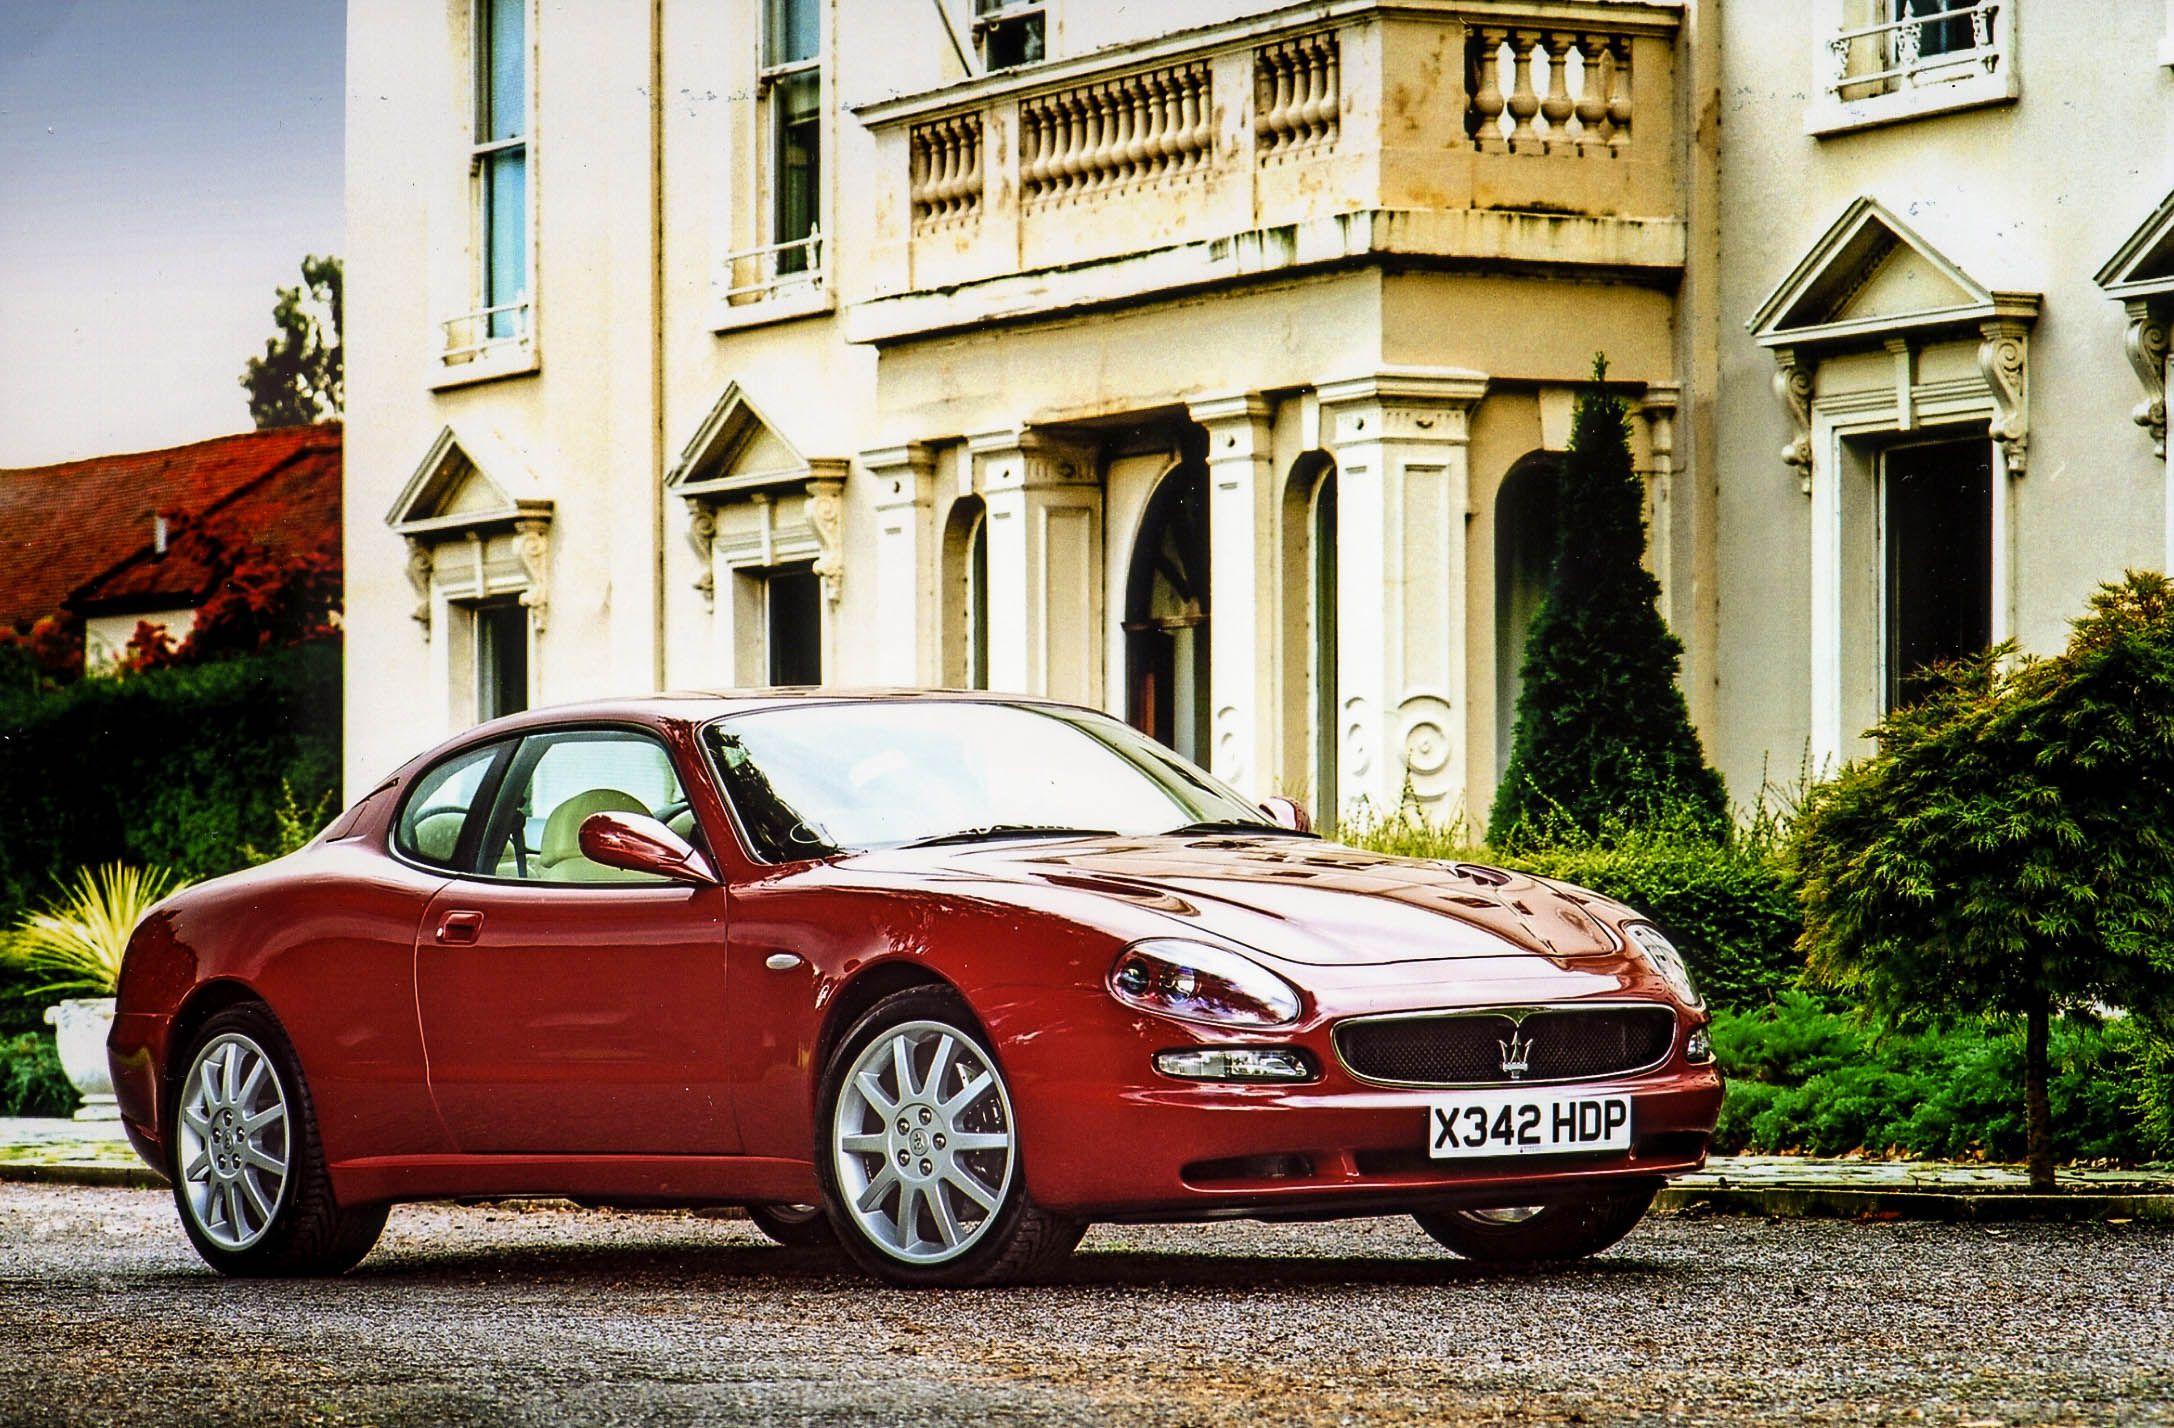 Maserati 3200 GT red